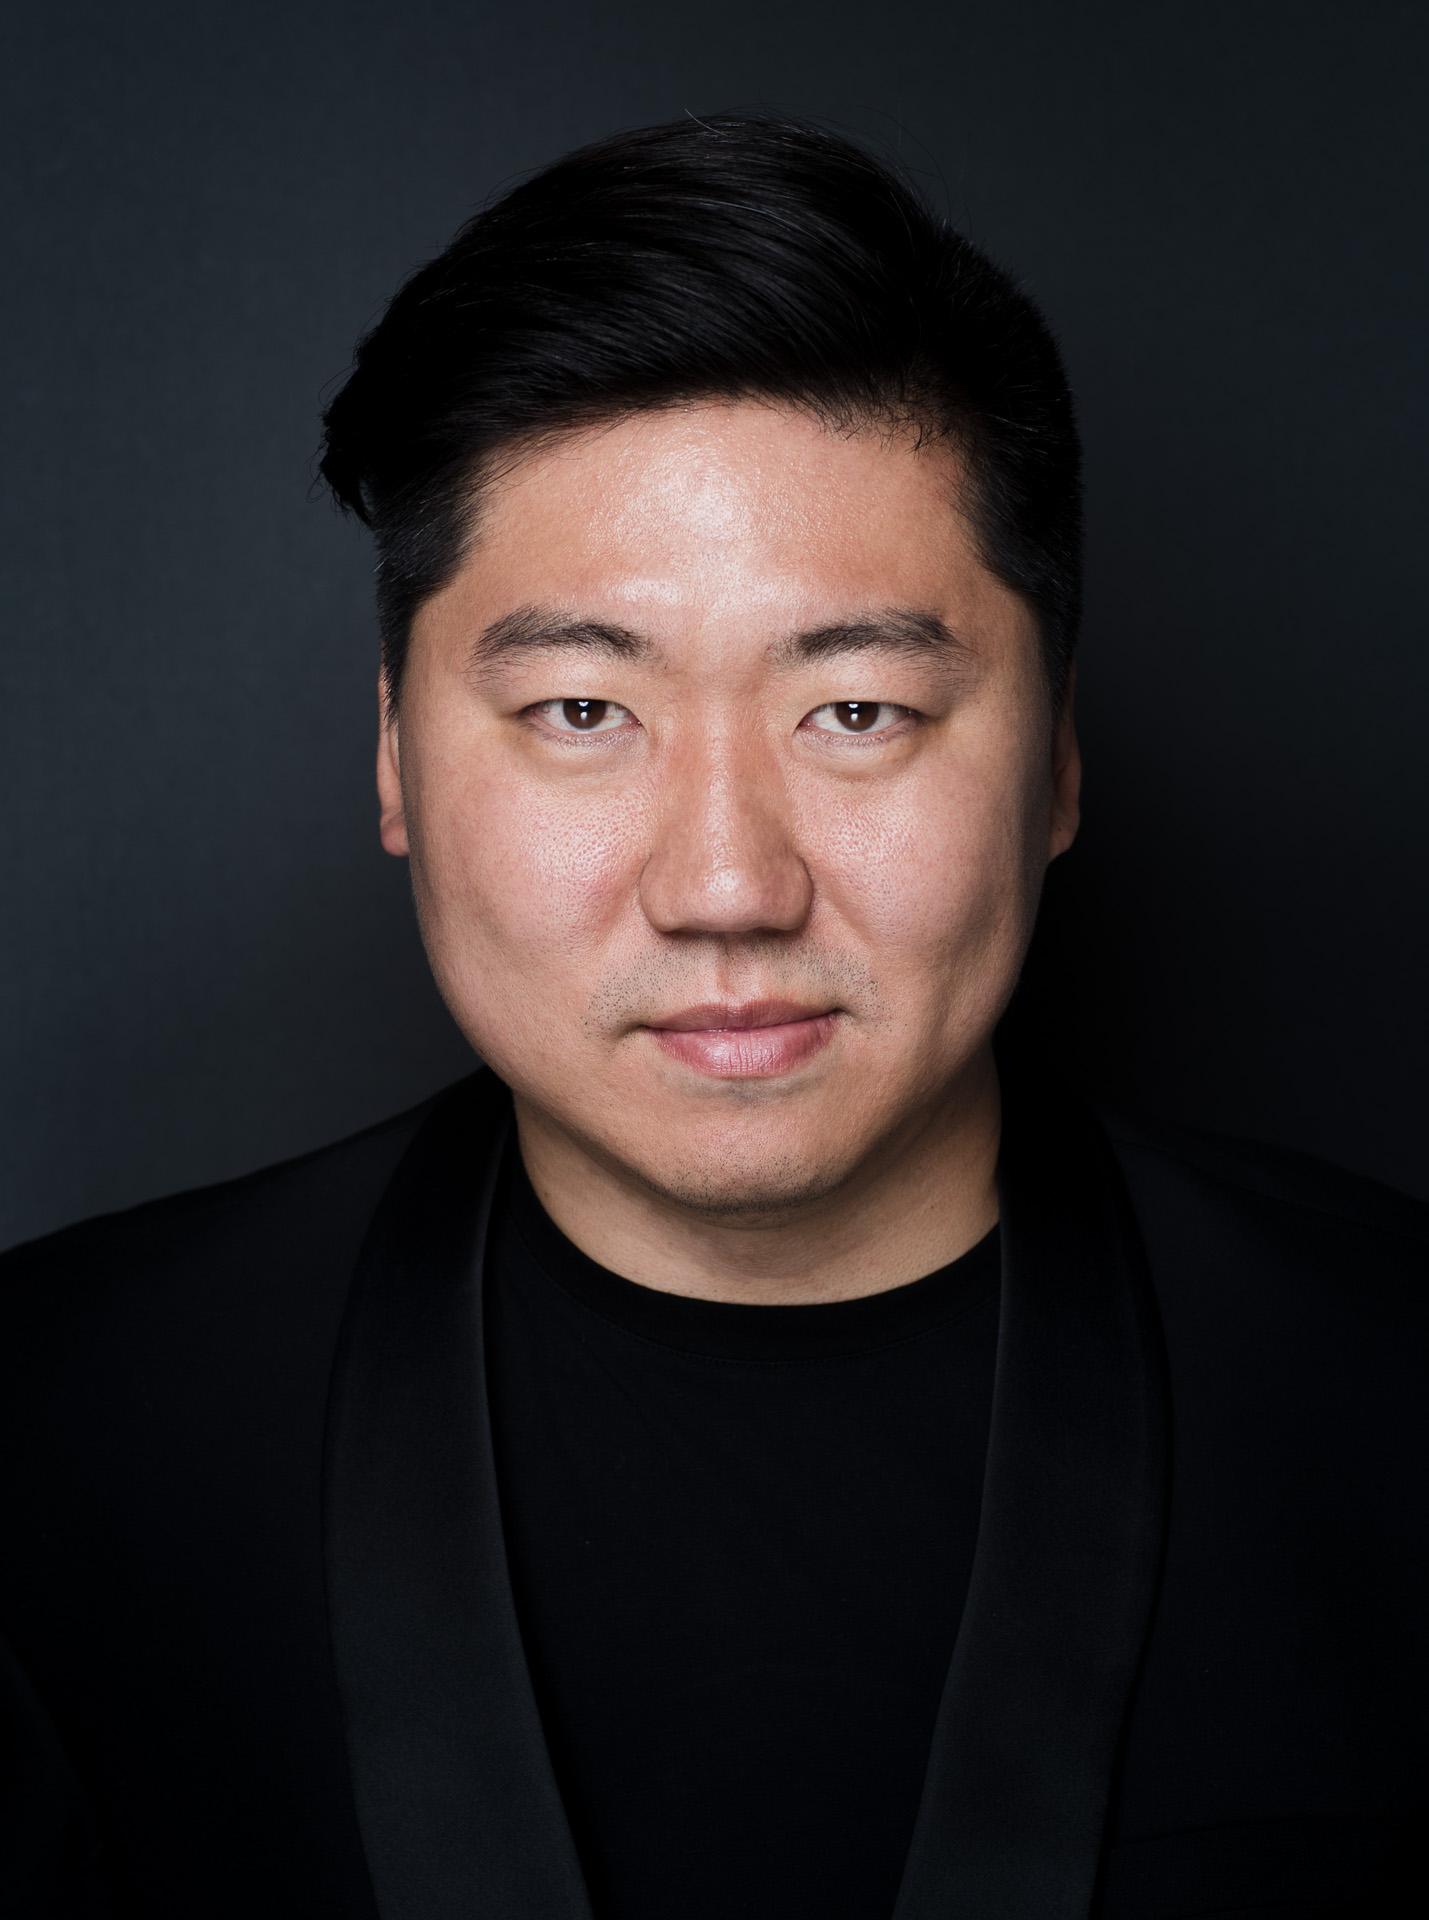 *SeungHyeon Baek, Baritone